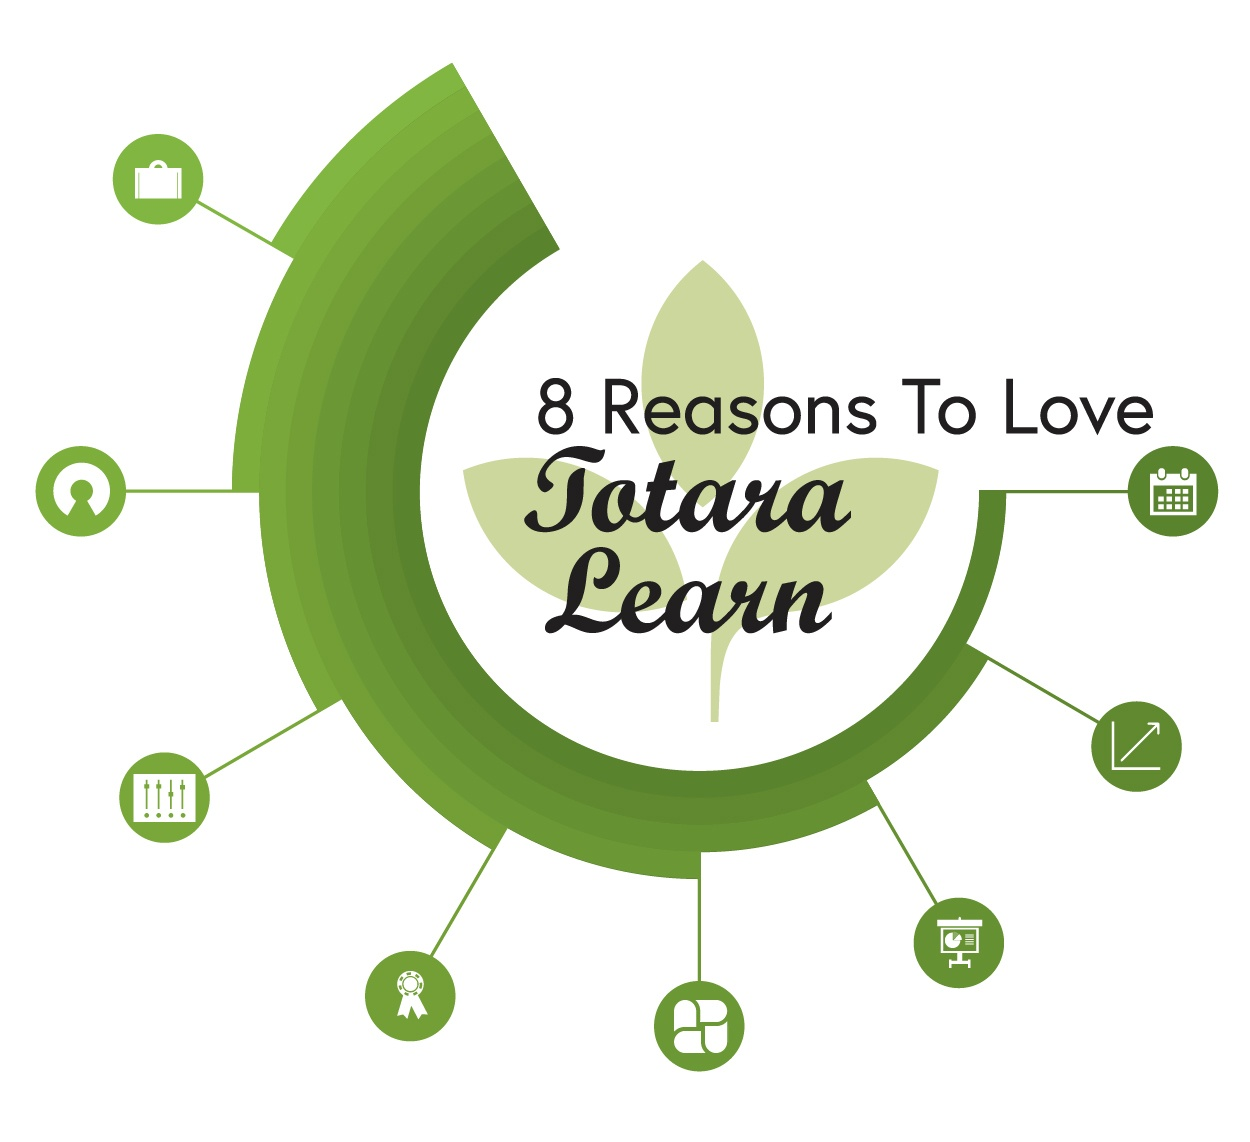 8 reasons to love Totara Learn - Infographic